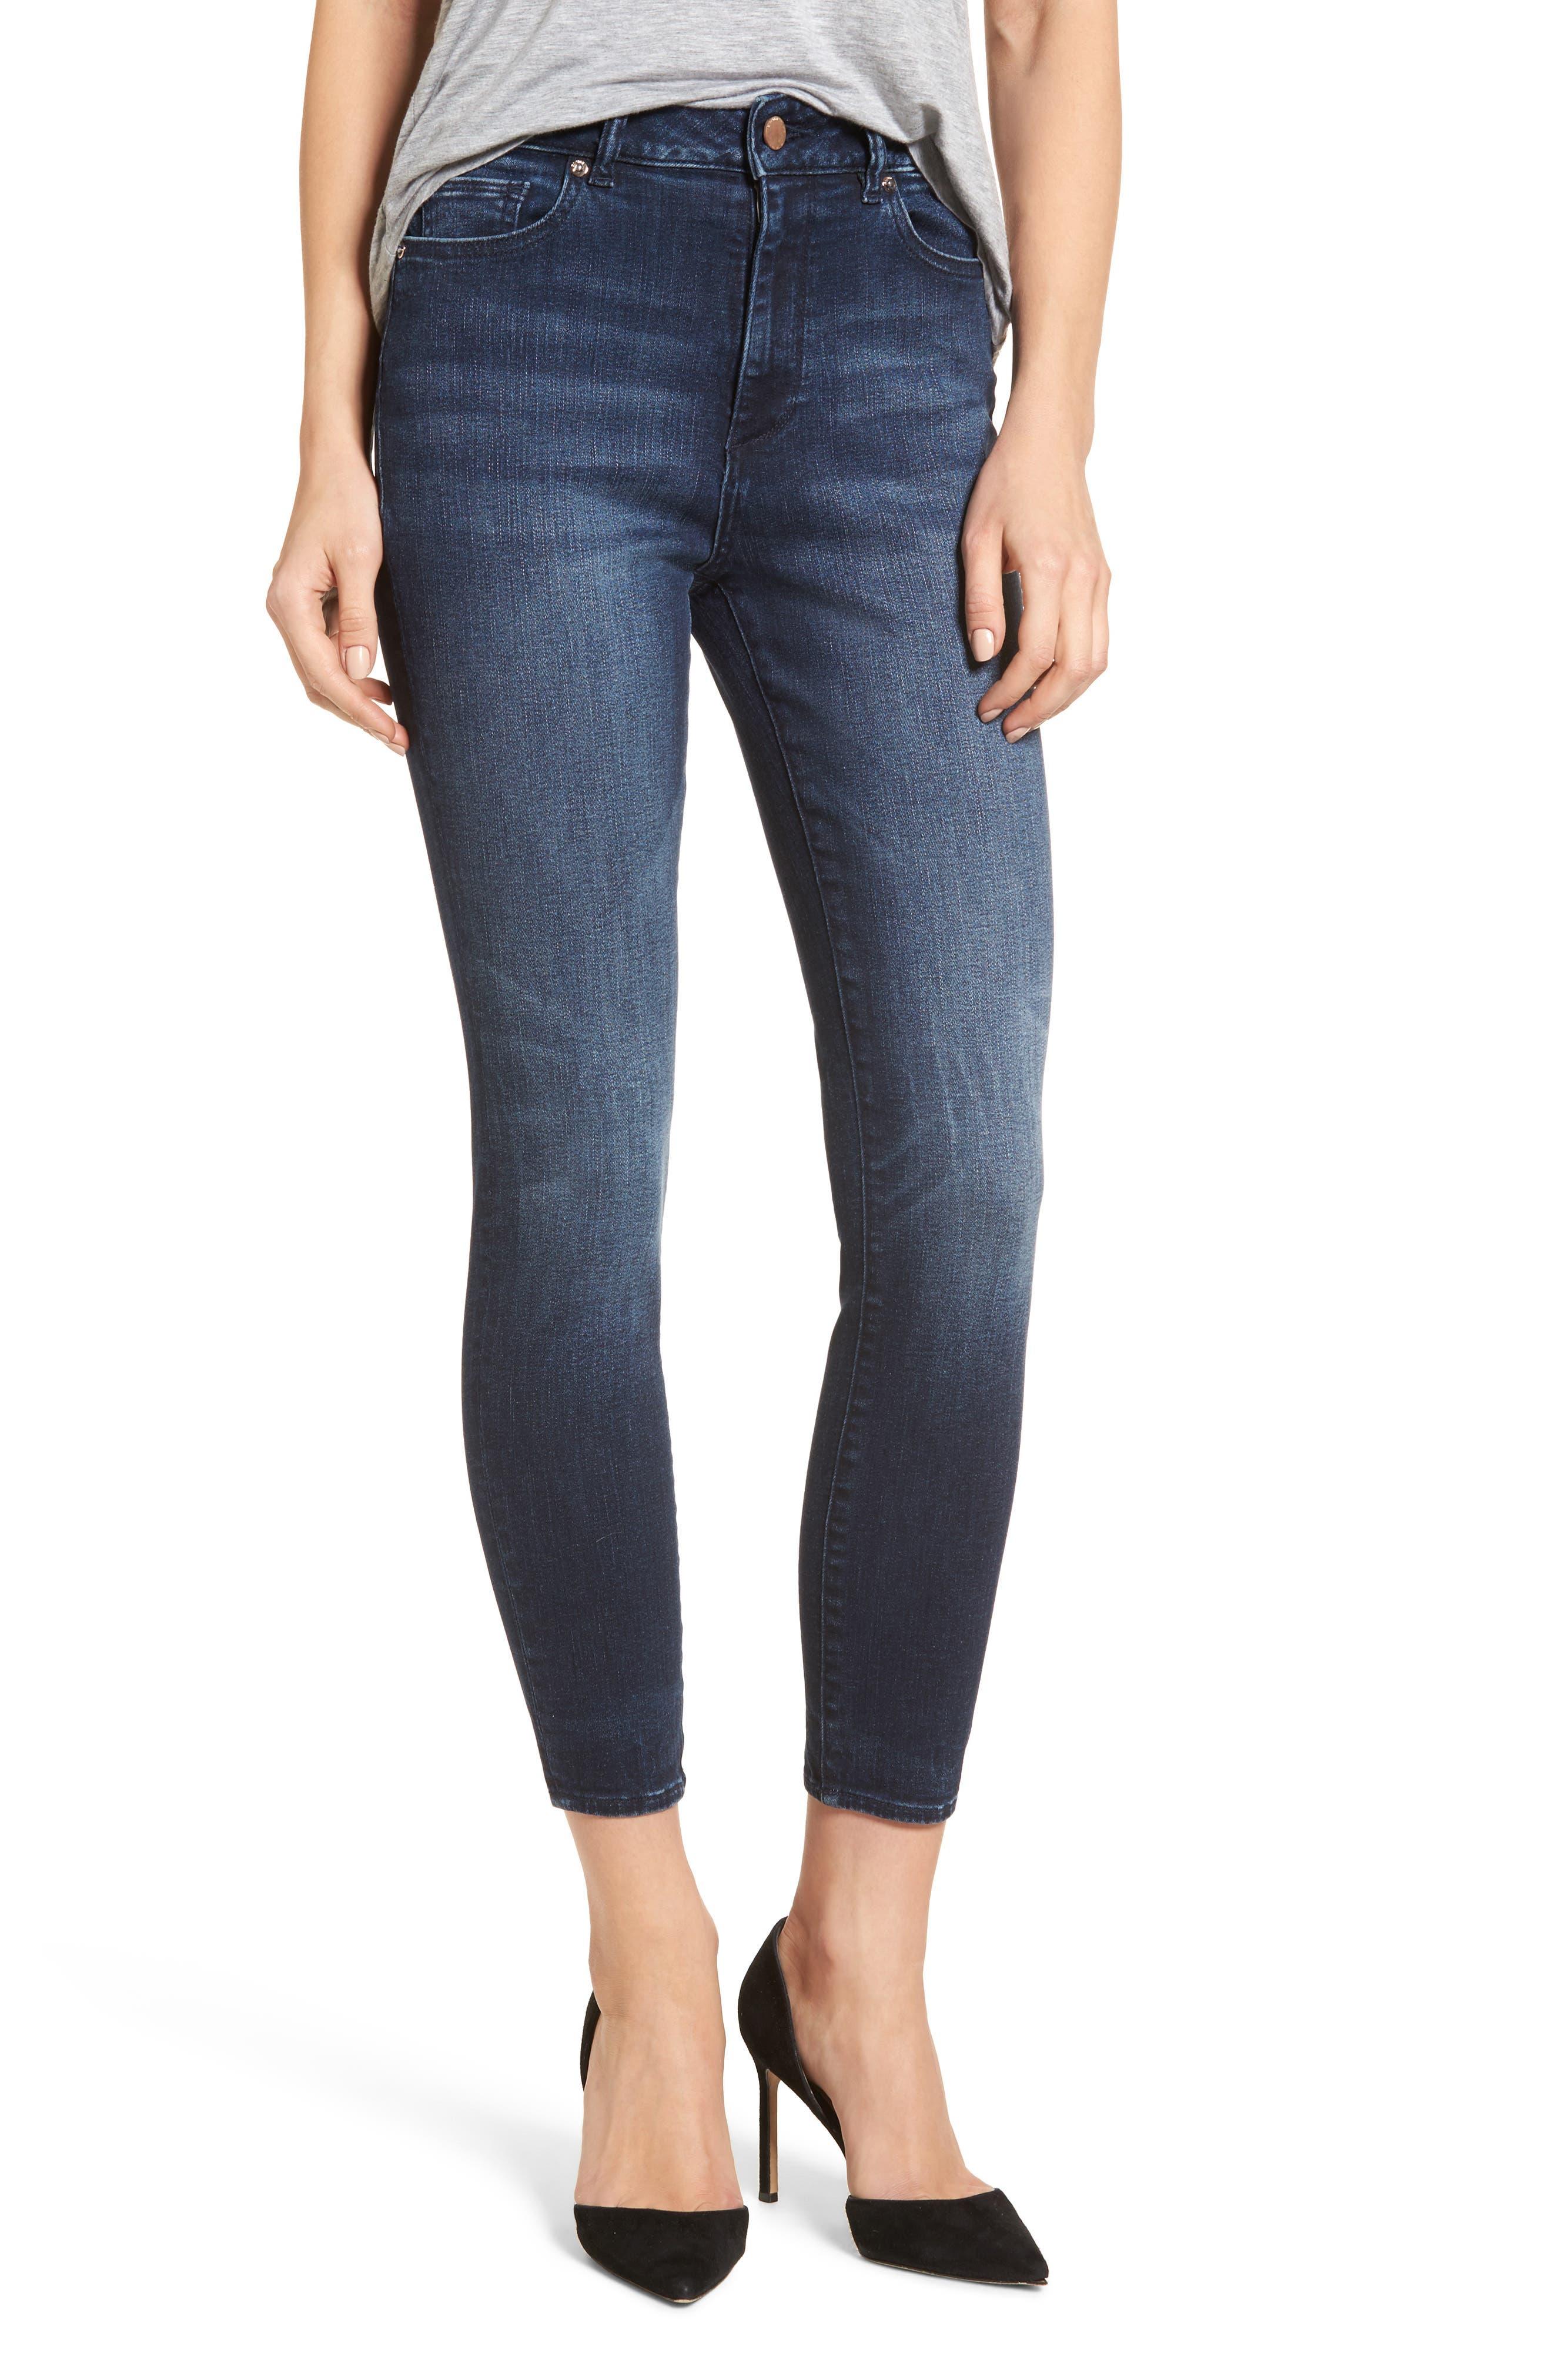 Carlie High Waist Ankle Skinny Jeans,                         Main,                         color, Spritz